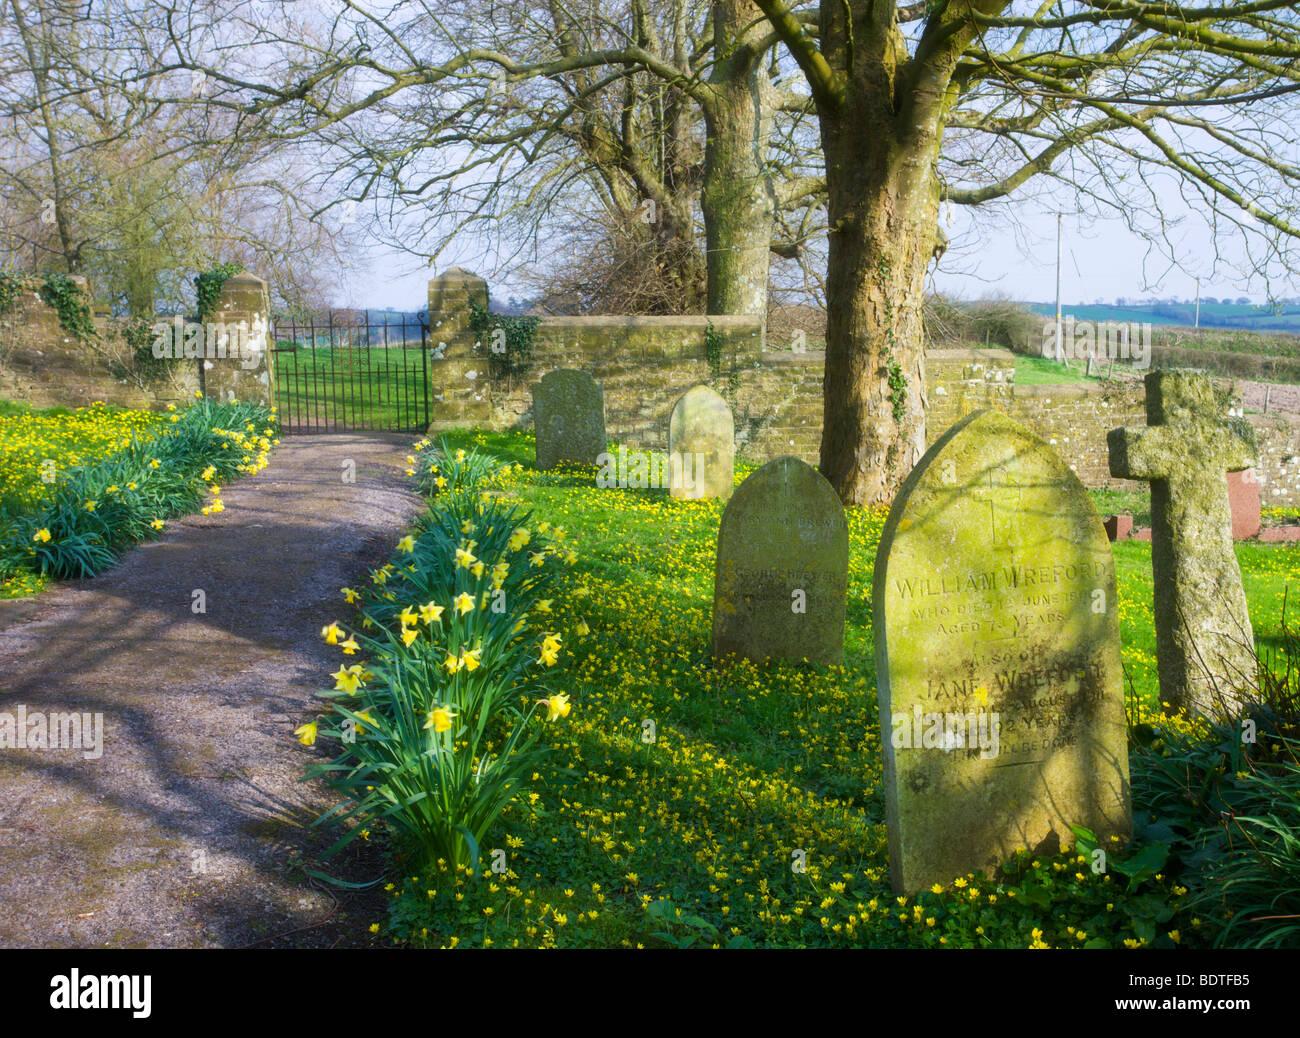 Spring Flowers Growing In Morchard Bishop Church Graveyard